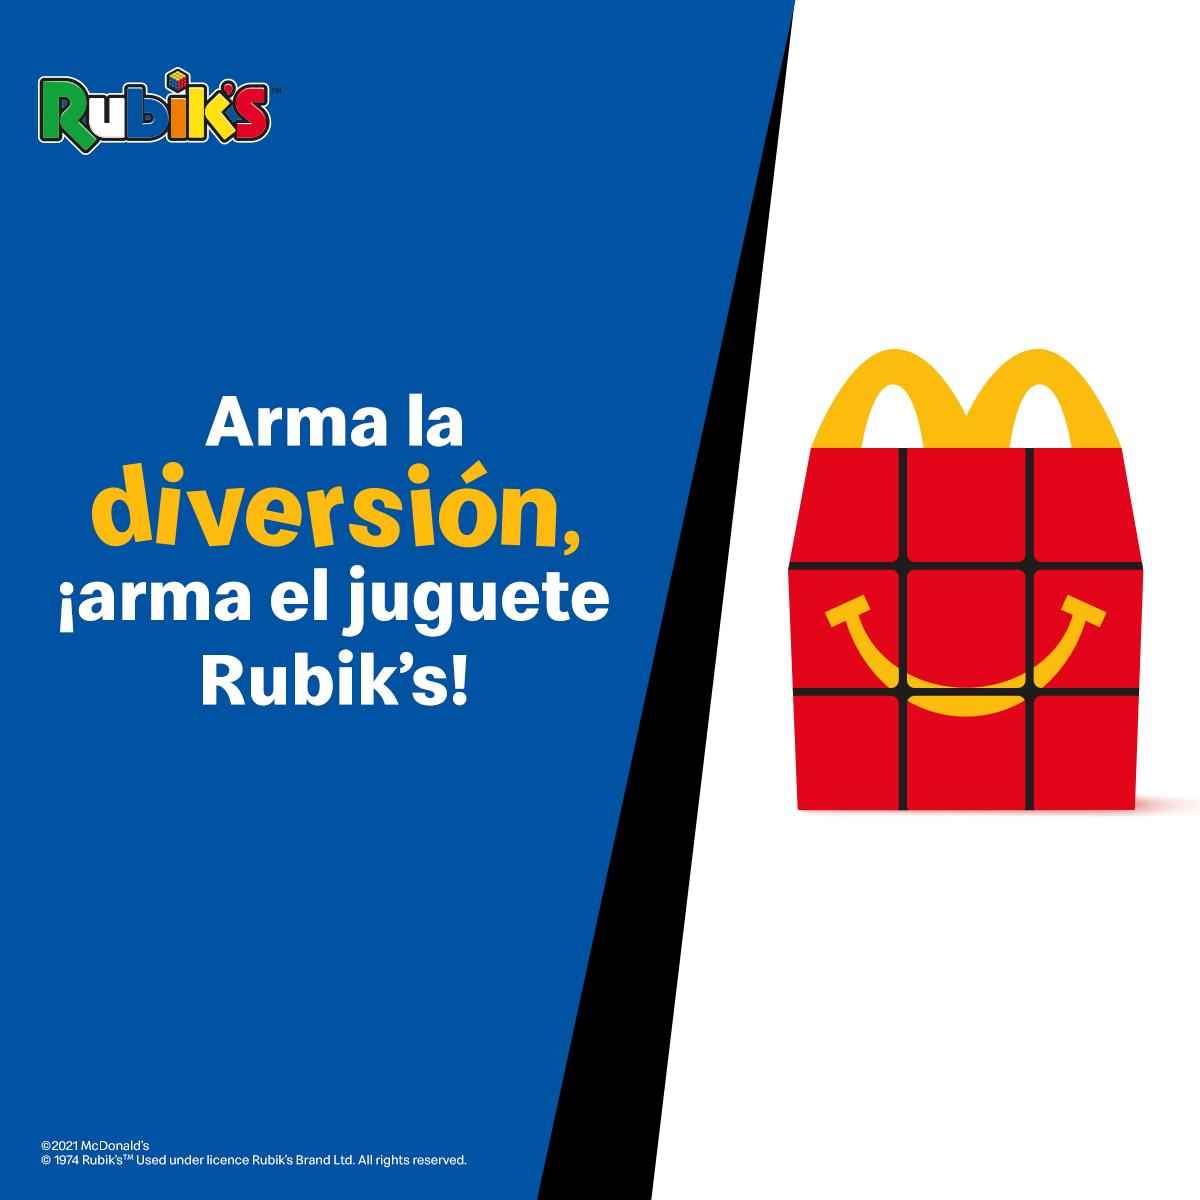 McDonald'sincluye en su Cajita Felizelcubo deRubik's, eljuguete más vendidodelahistoria